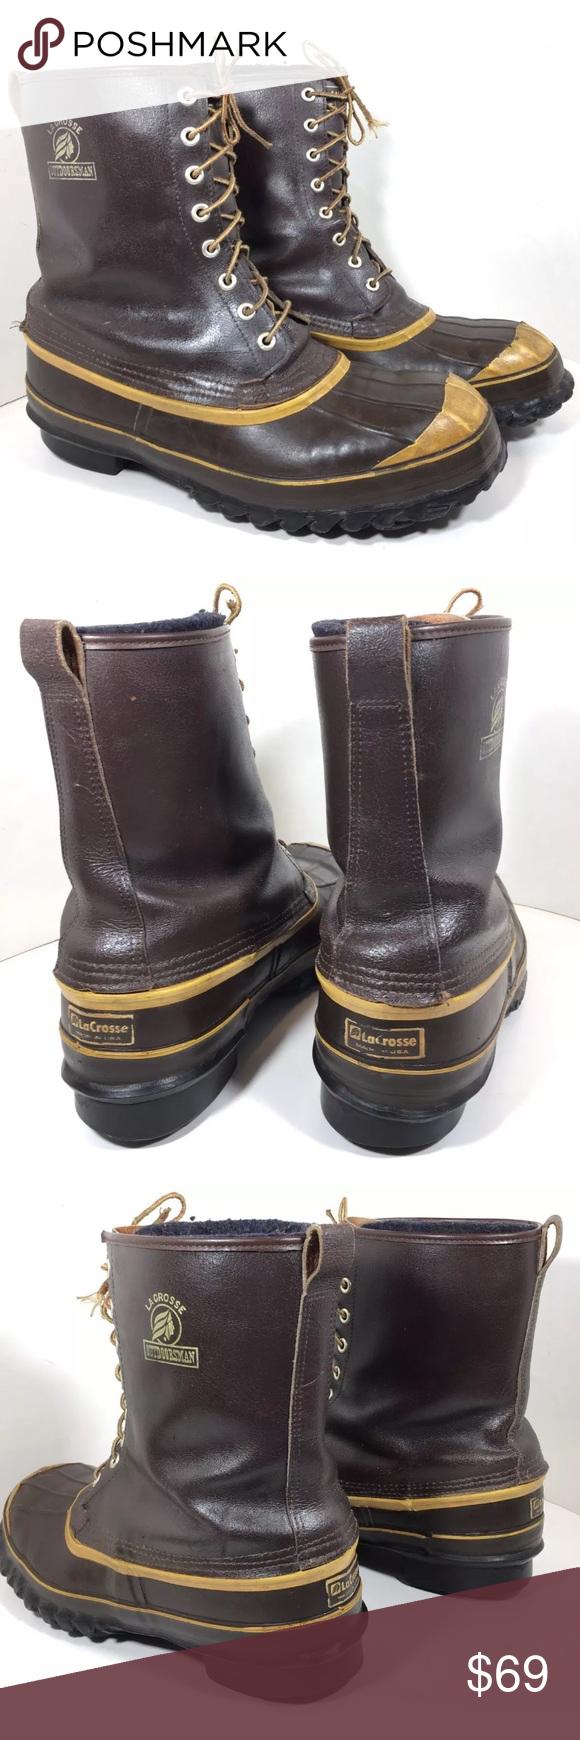 7b366d098cb Whites / La Crosse Steel Toe PAC Snow Winter Boot Men's Whites ...